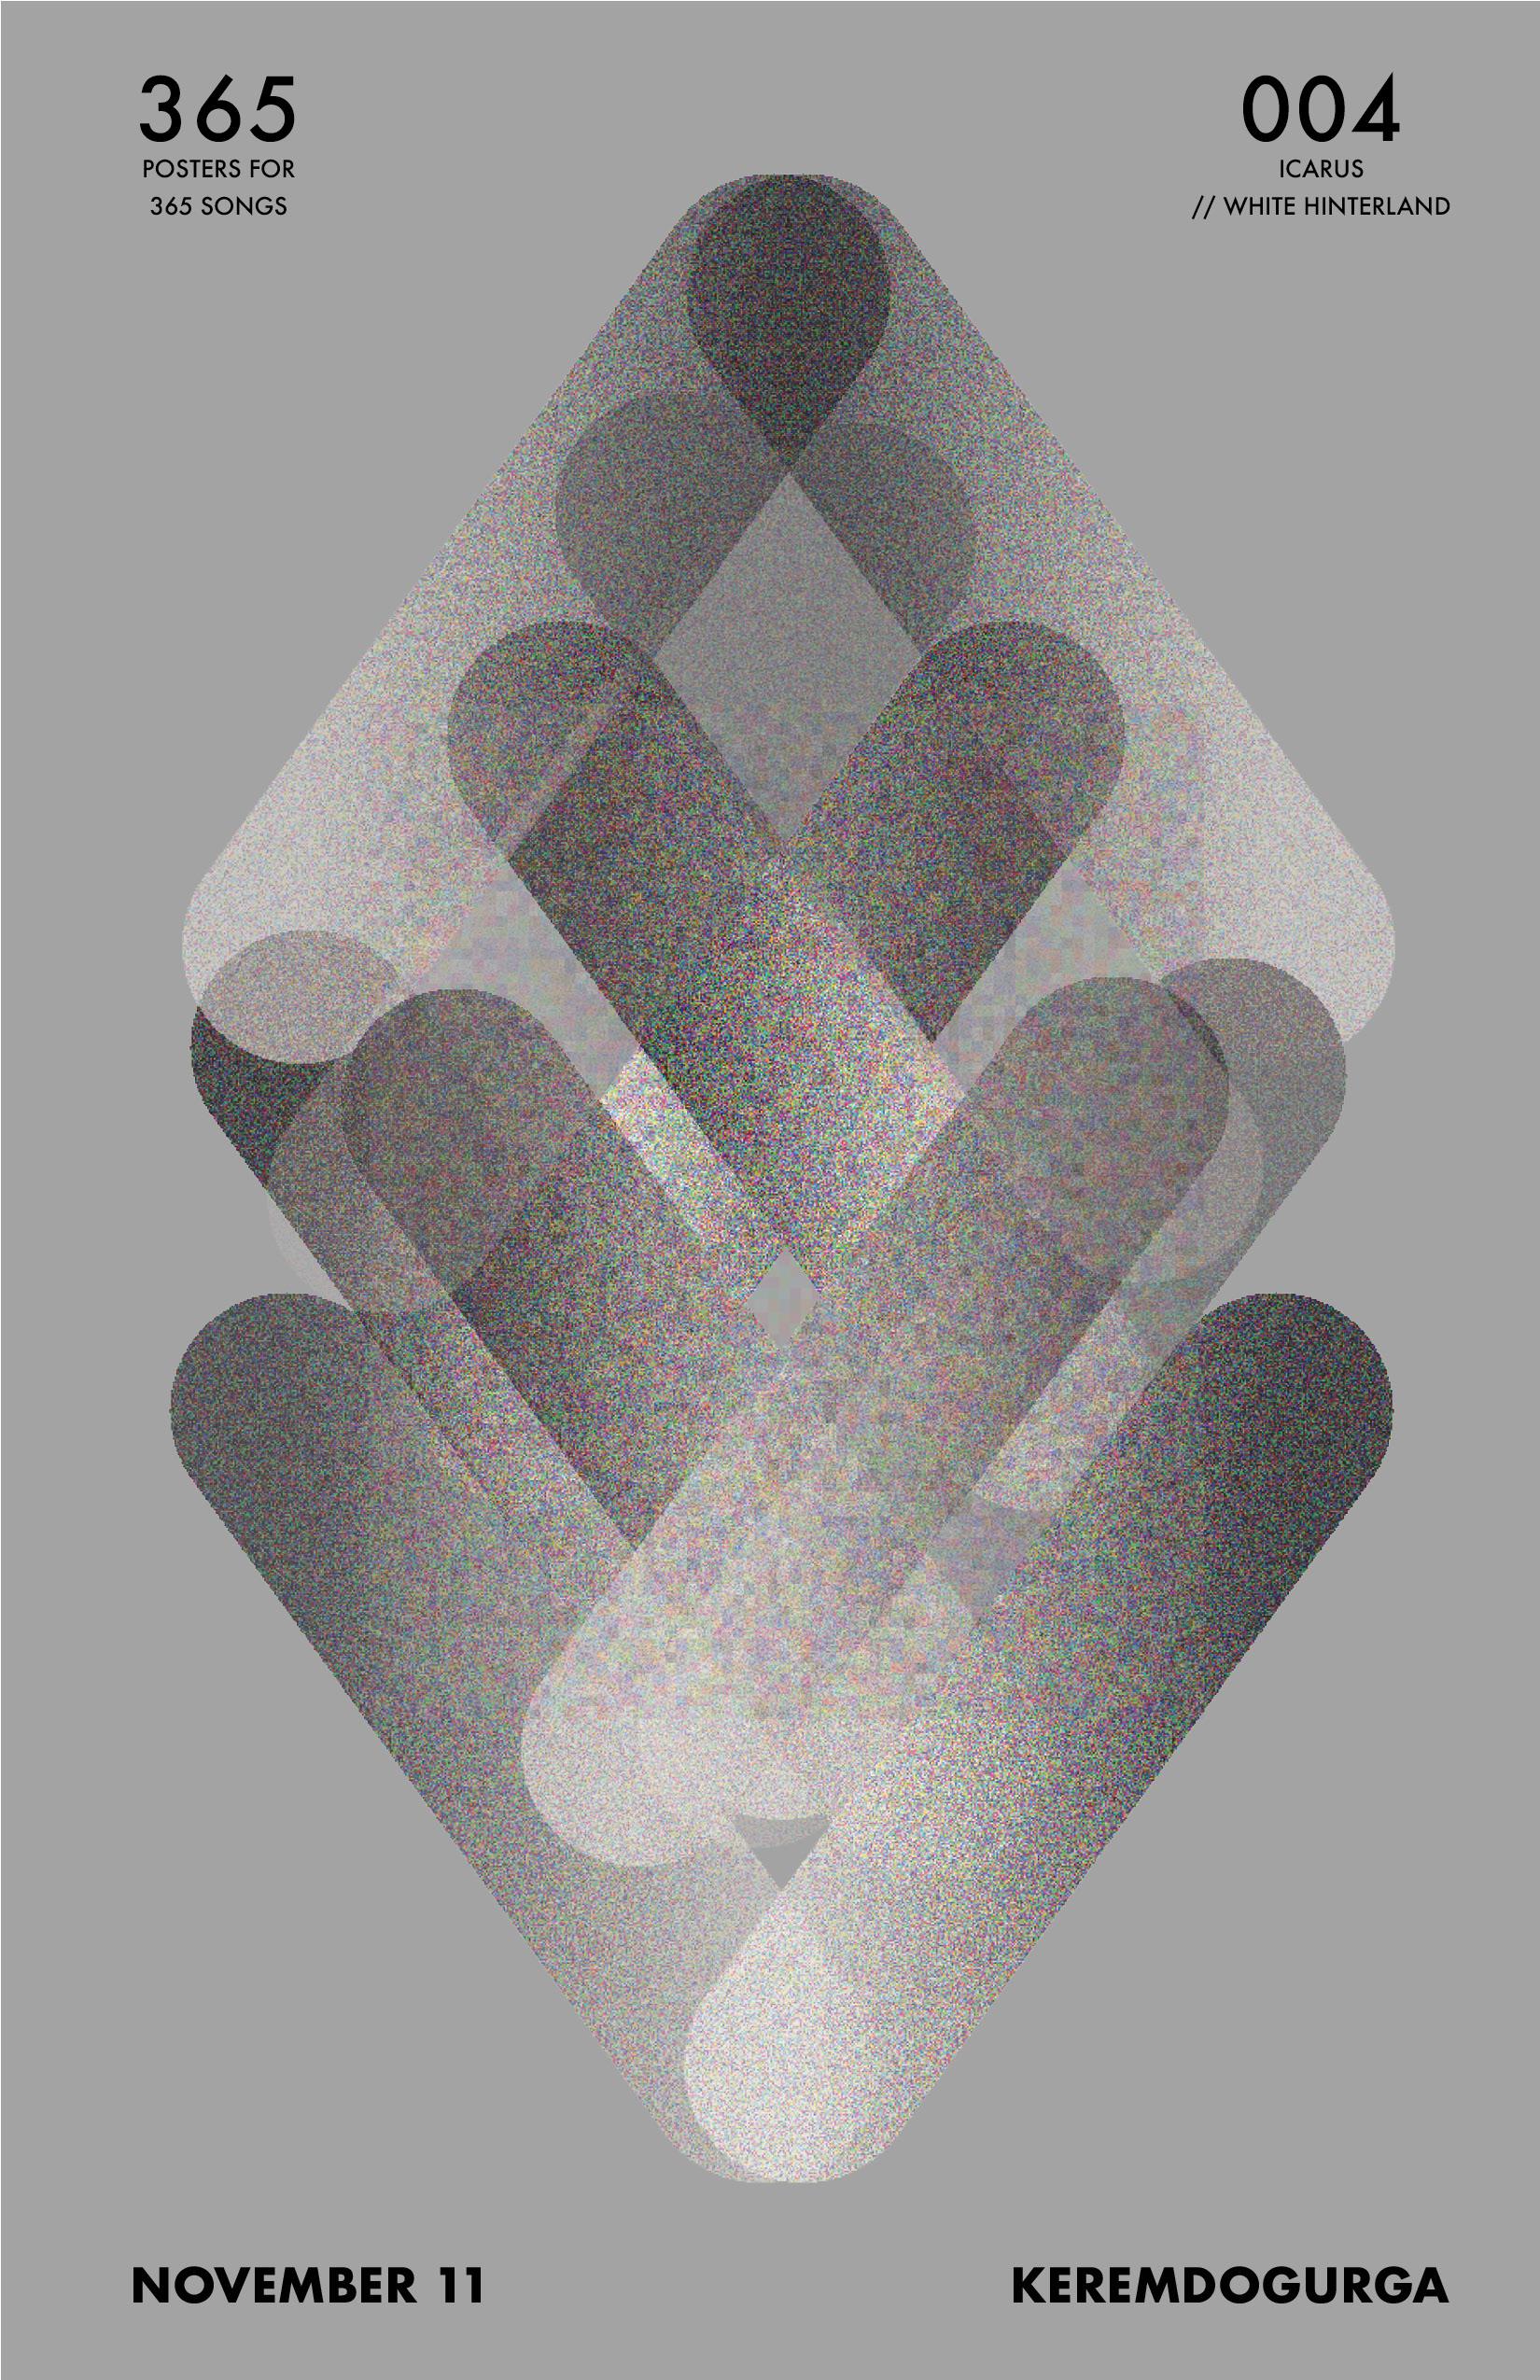 004 Icarus // White Hinterland